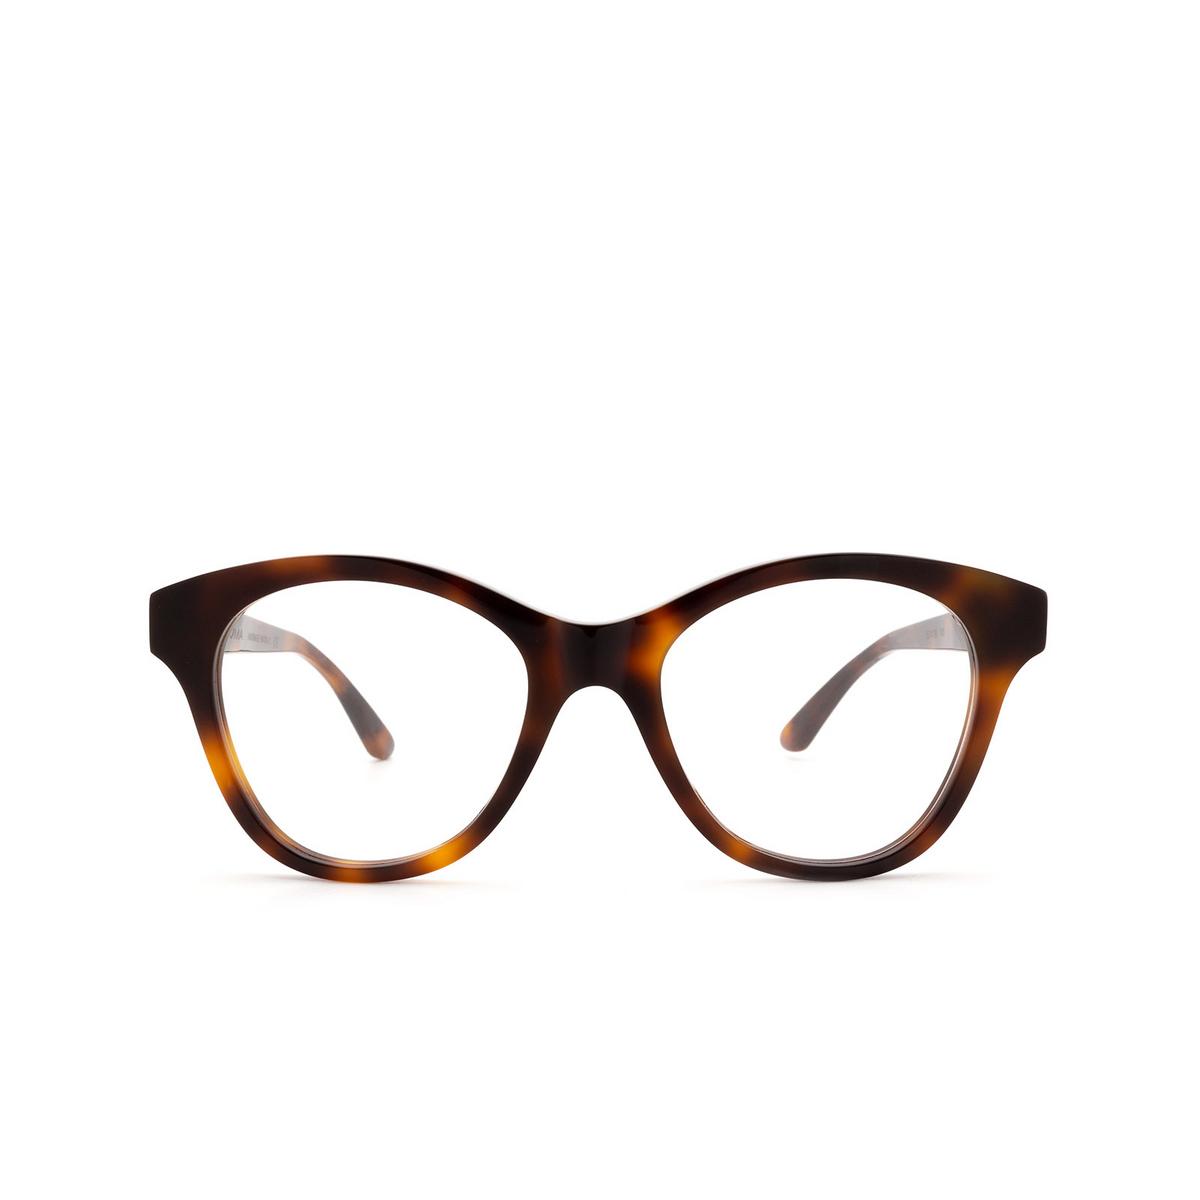 Huma® Cat-eye Eyeglasses: Mia color Havana 00V - front view.